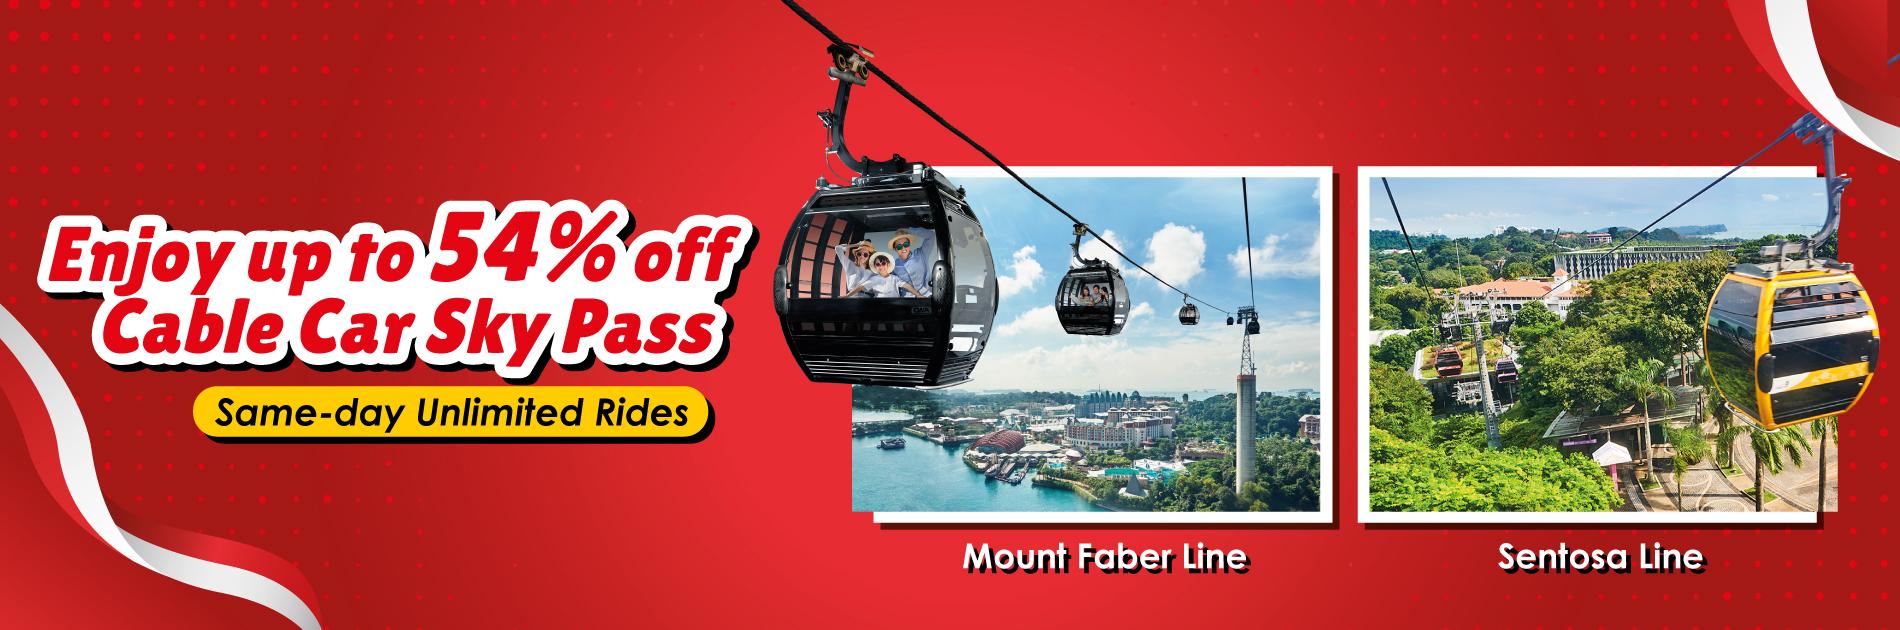 #0563_B2C_FY2122-1FG-x-SAFRA-54%-OFF-Unlimited-Ride-1900-x-630